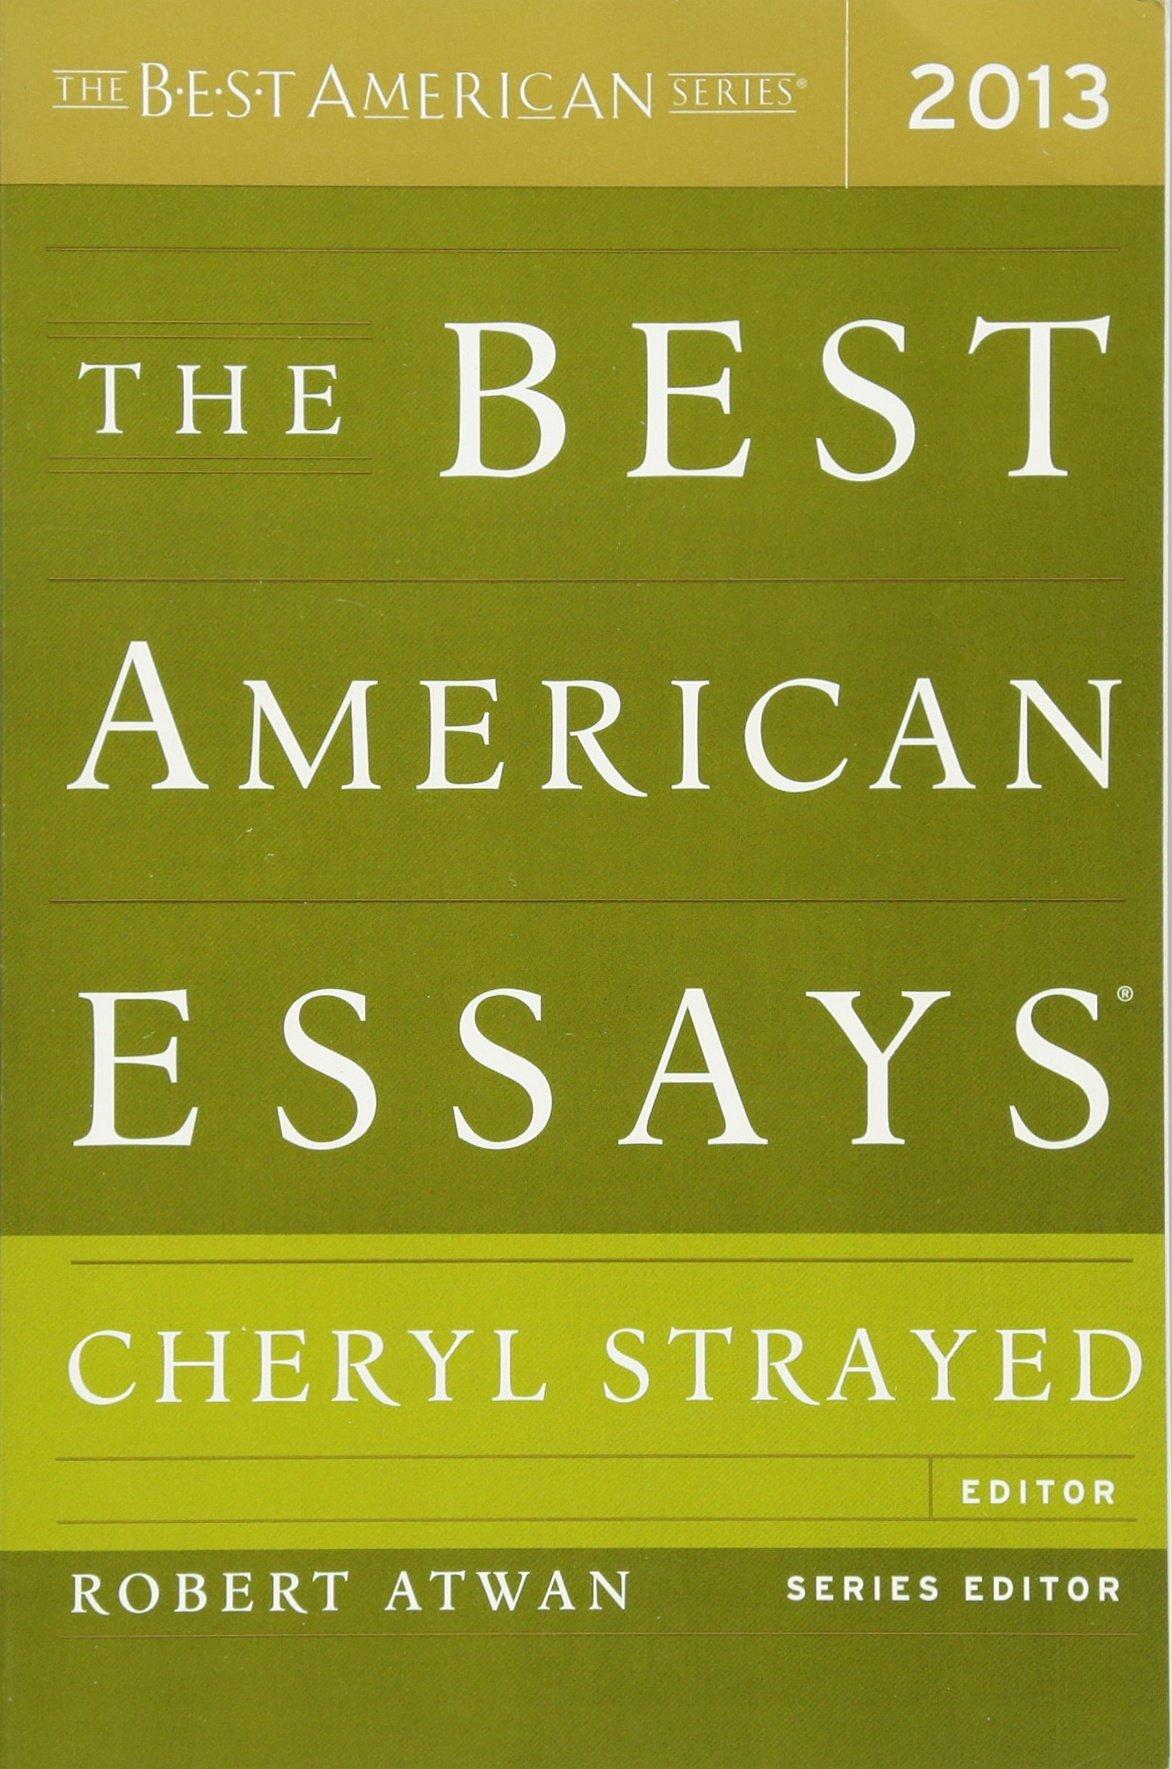 003 The Best American Essays 81nkls2j9vl Essay Wonderful 2013 Pdf Download Of Century Sparknotes 2017 Full